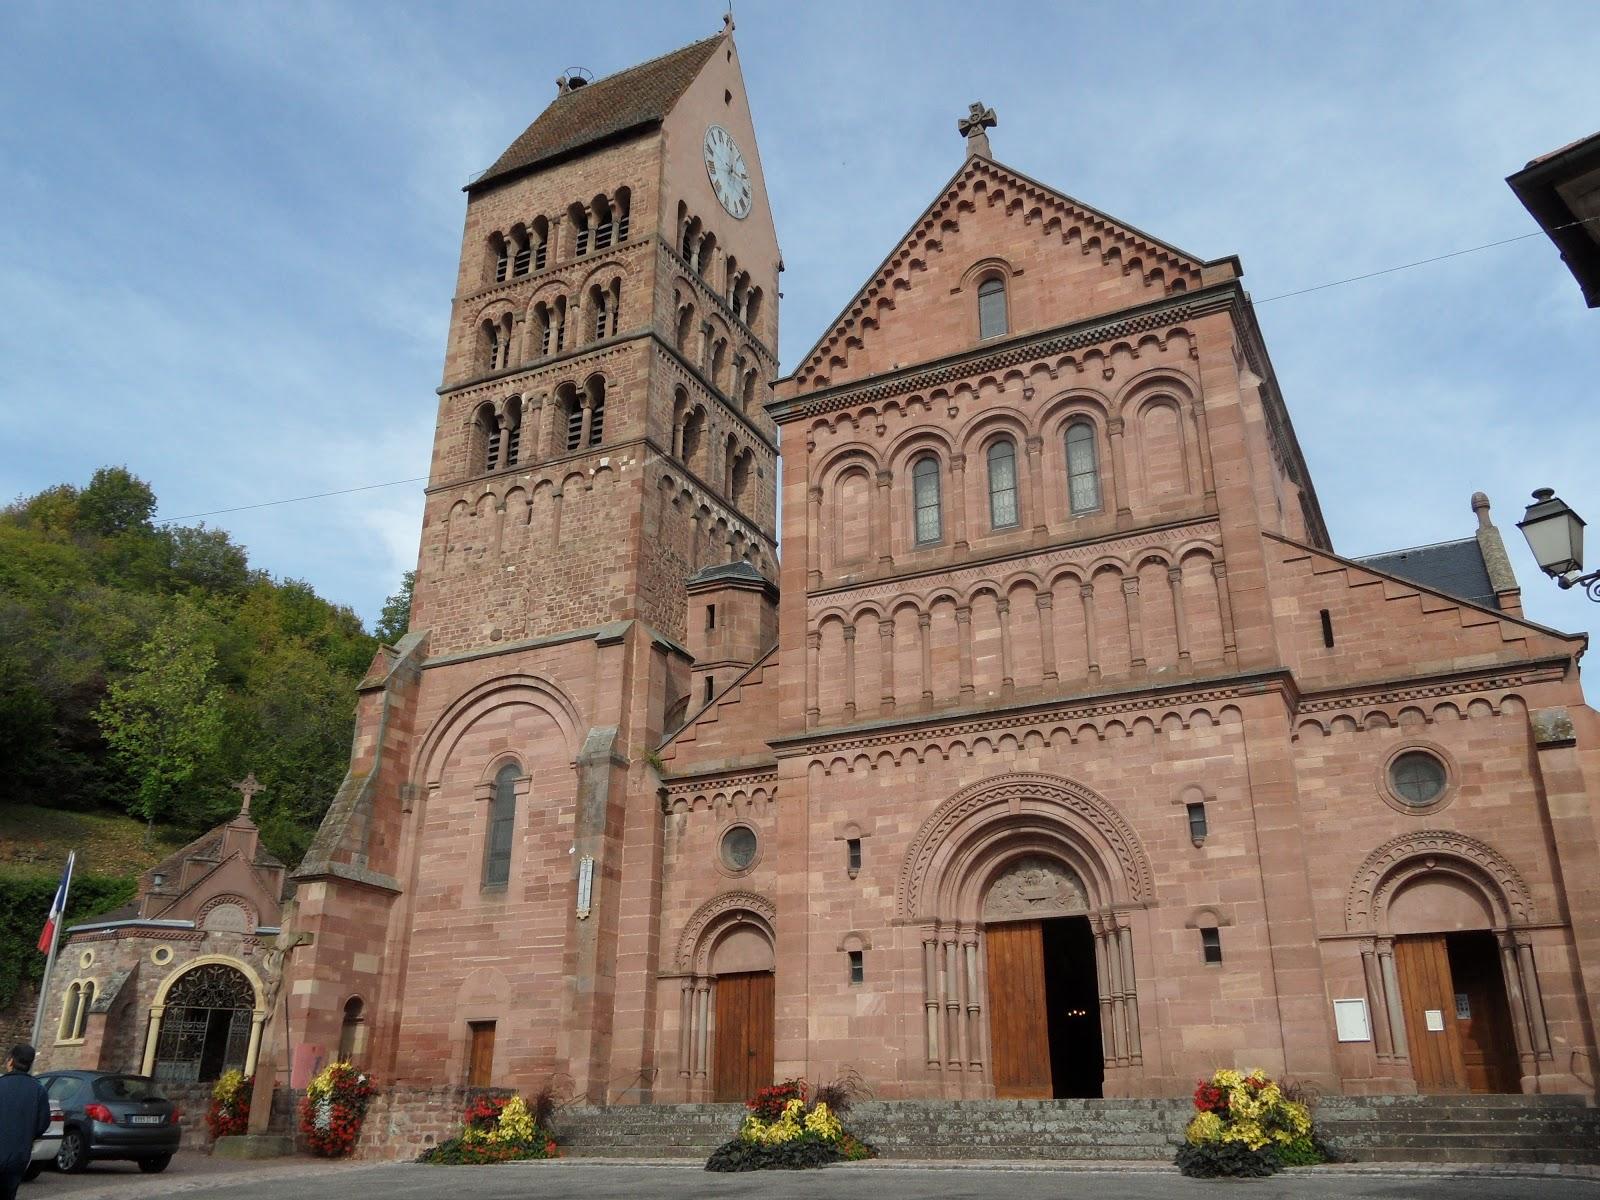 Gueberschwihr - Eglise la porte ouverte culte en direct ...